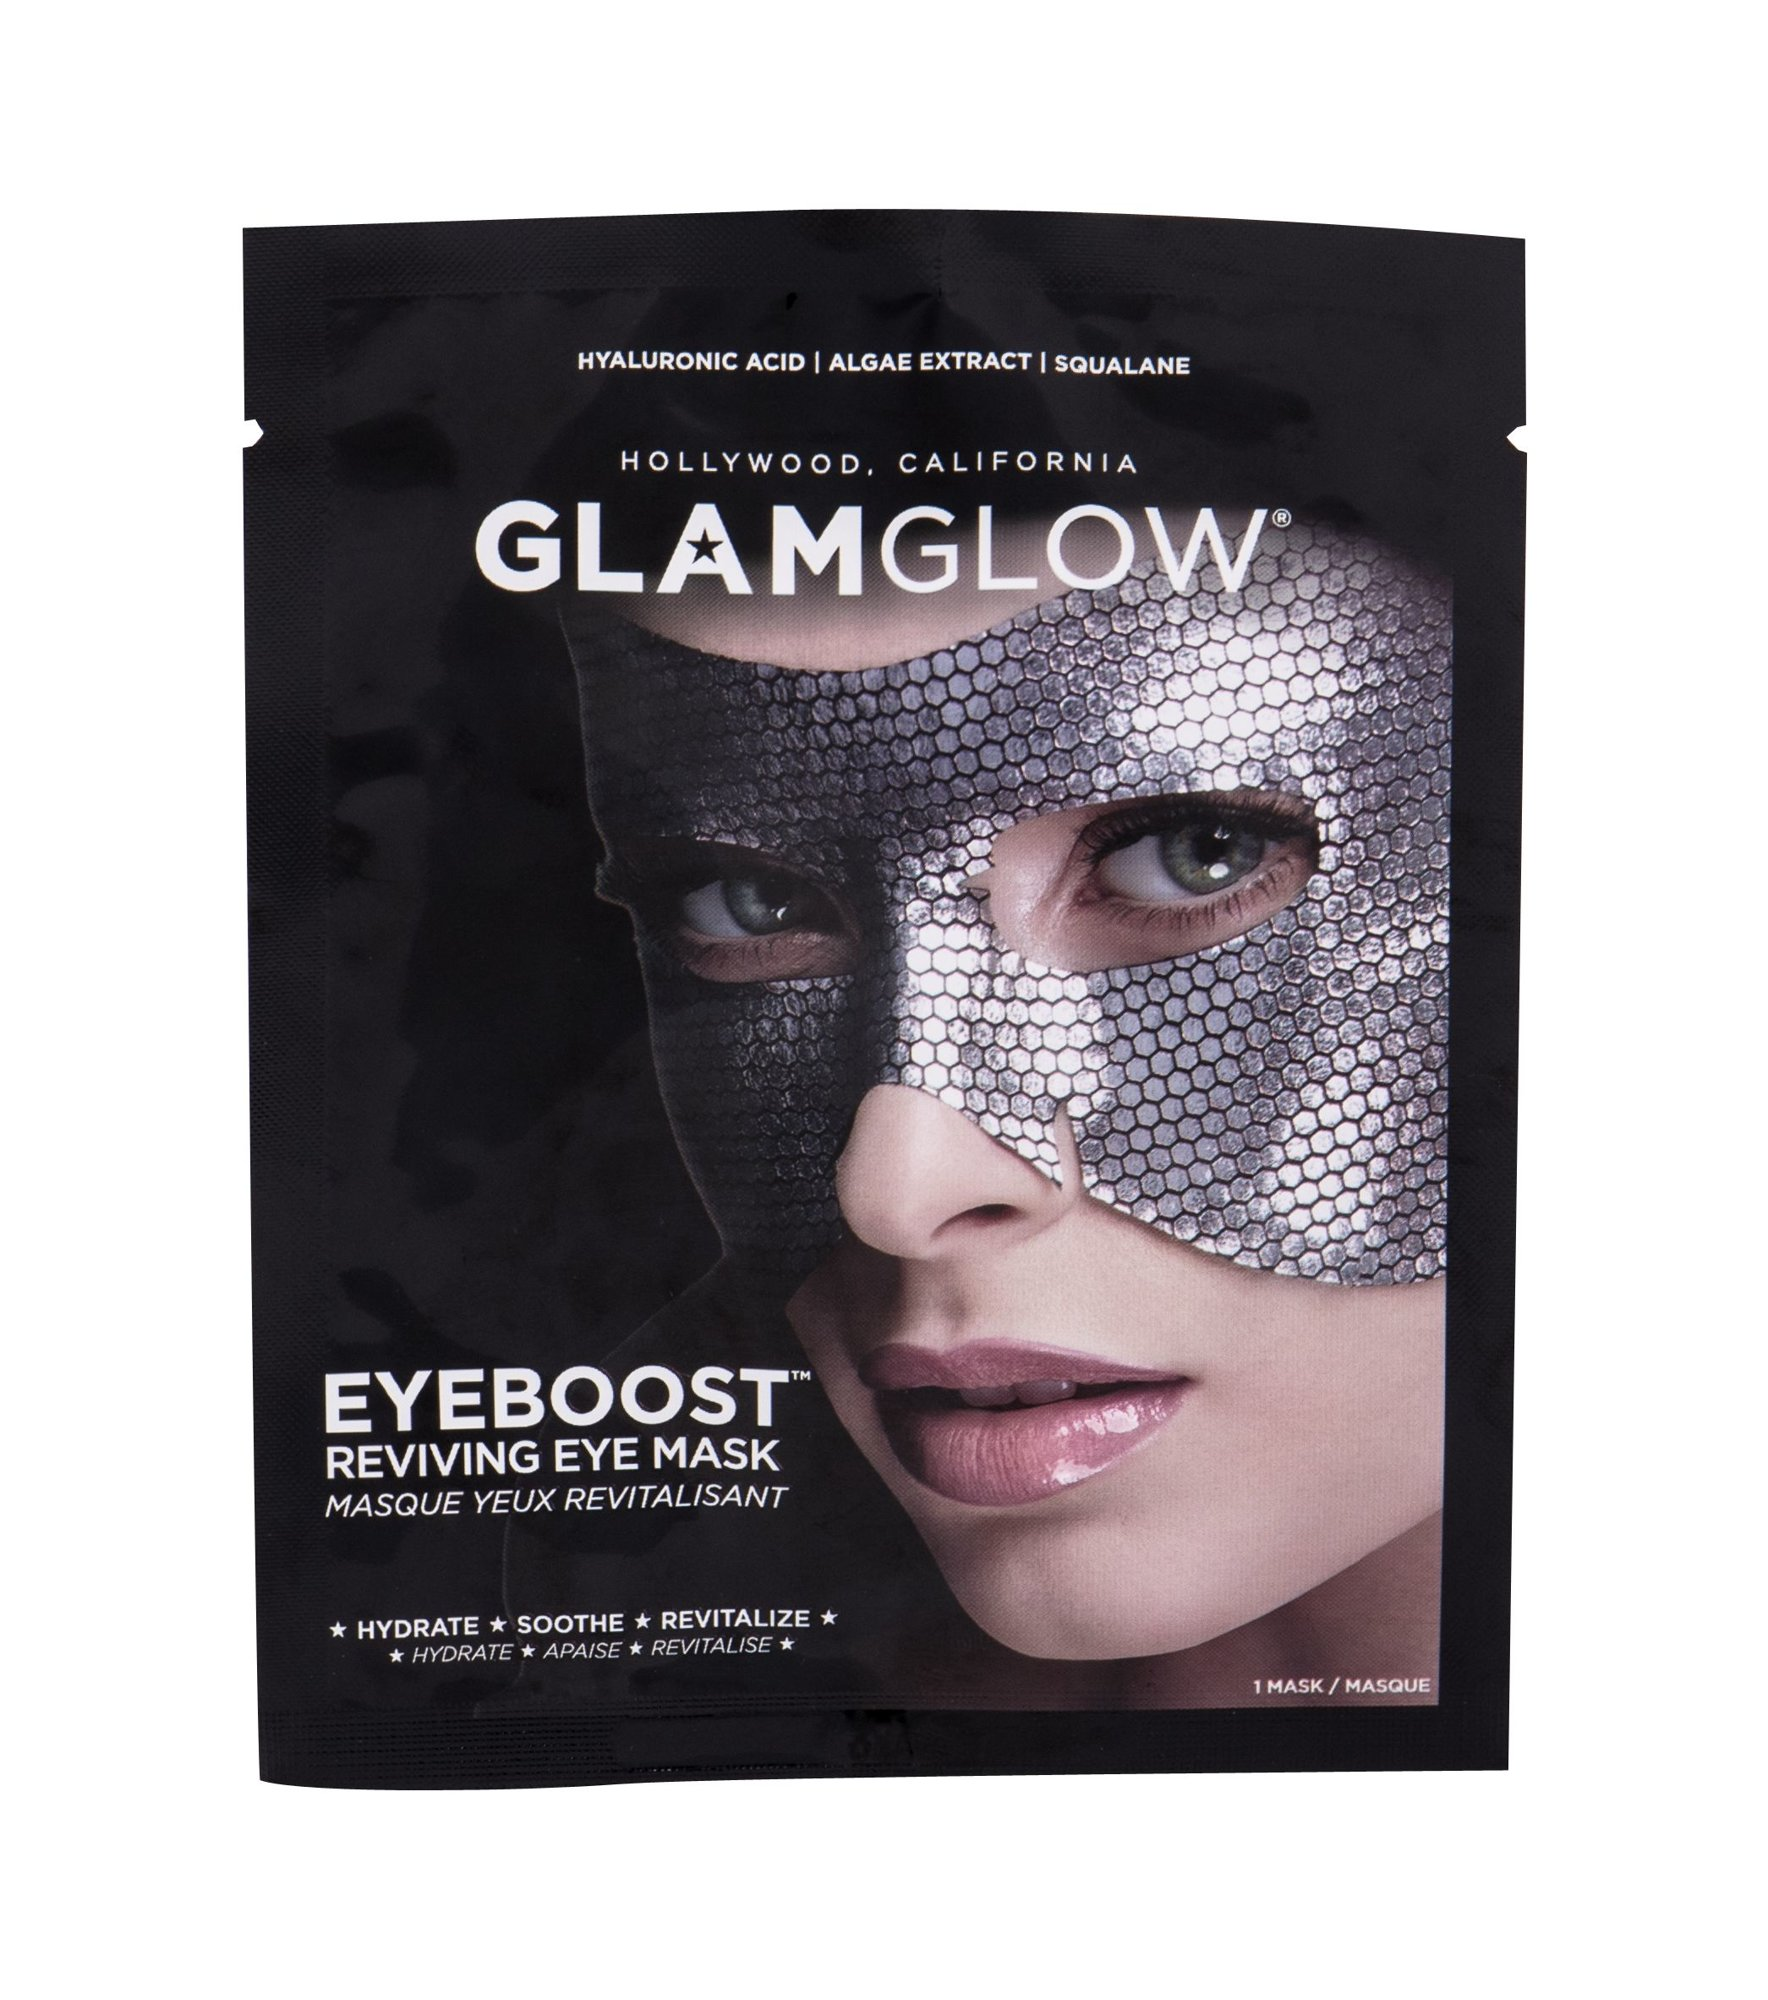 Glam Glow Eyeboost Face Mask 1ml